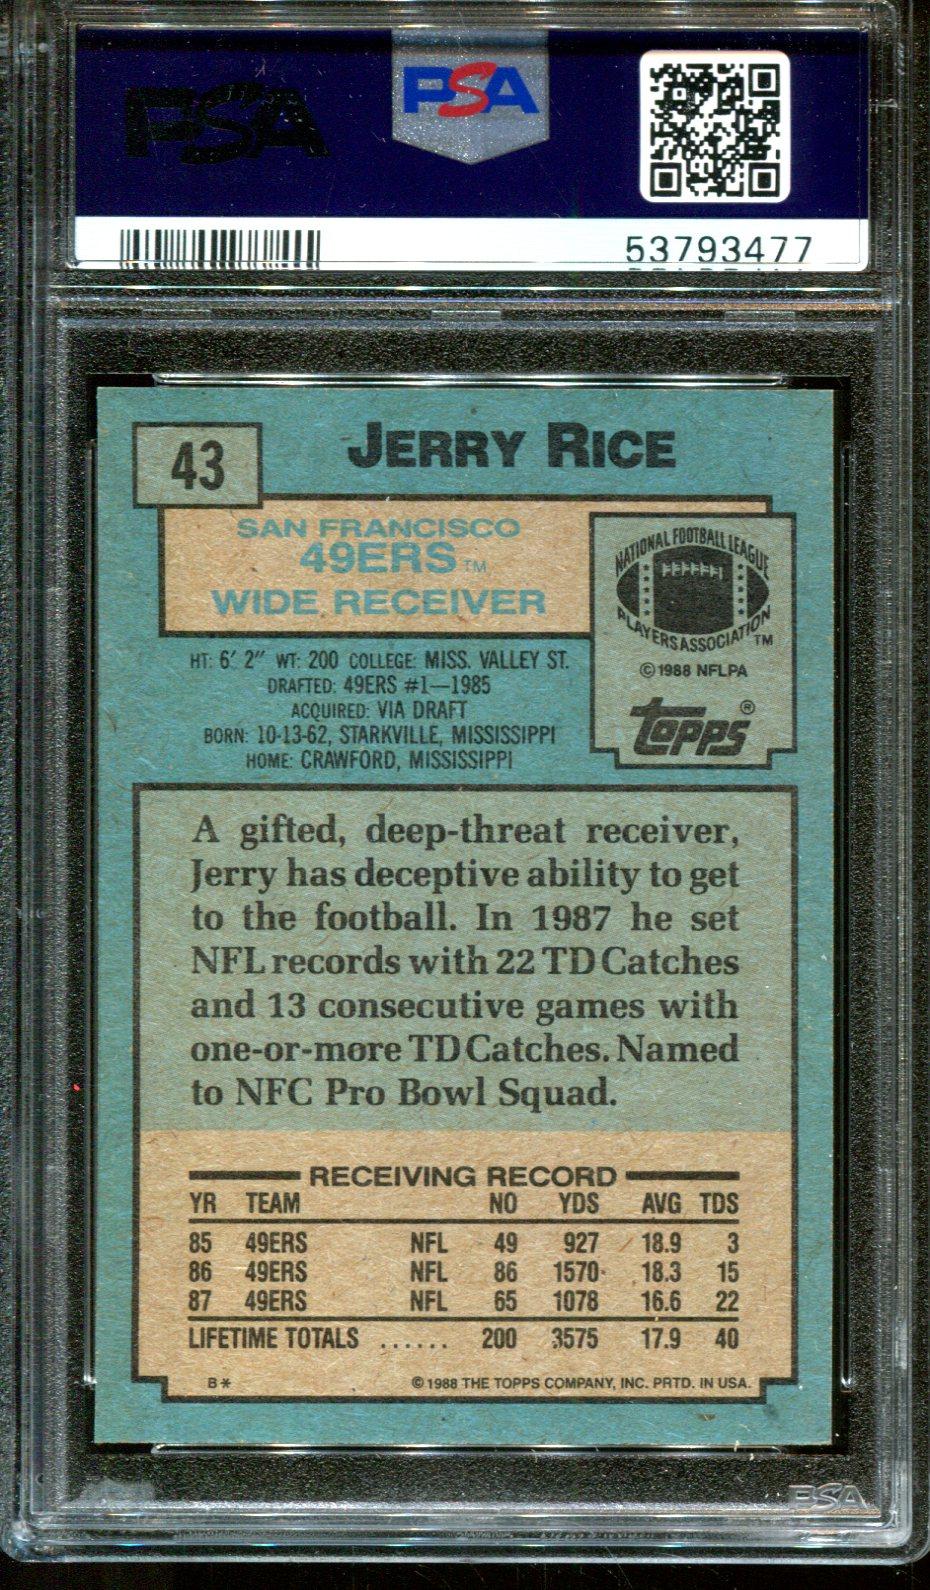 thumbnail 2 - 1988 TOPPS #43 JERRY RICE 49ERS HOF PSA 10 A3087643-477